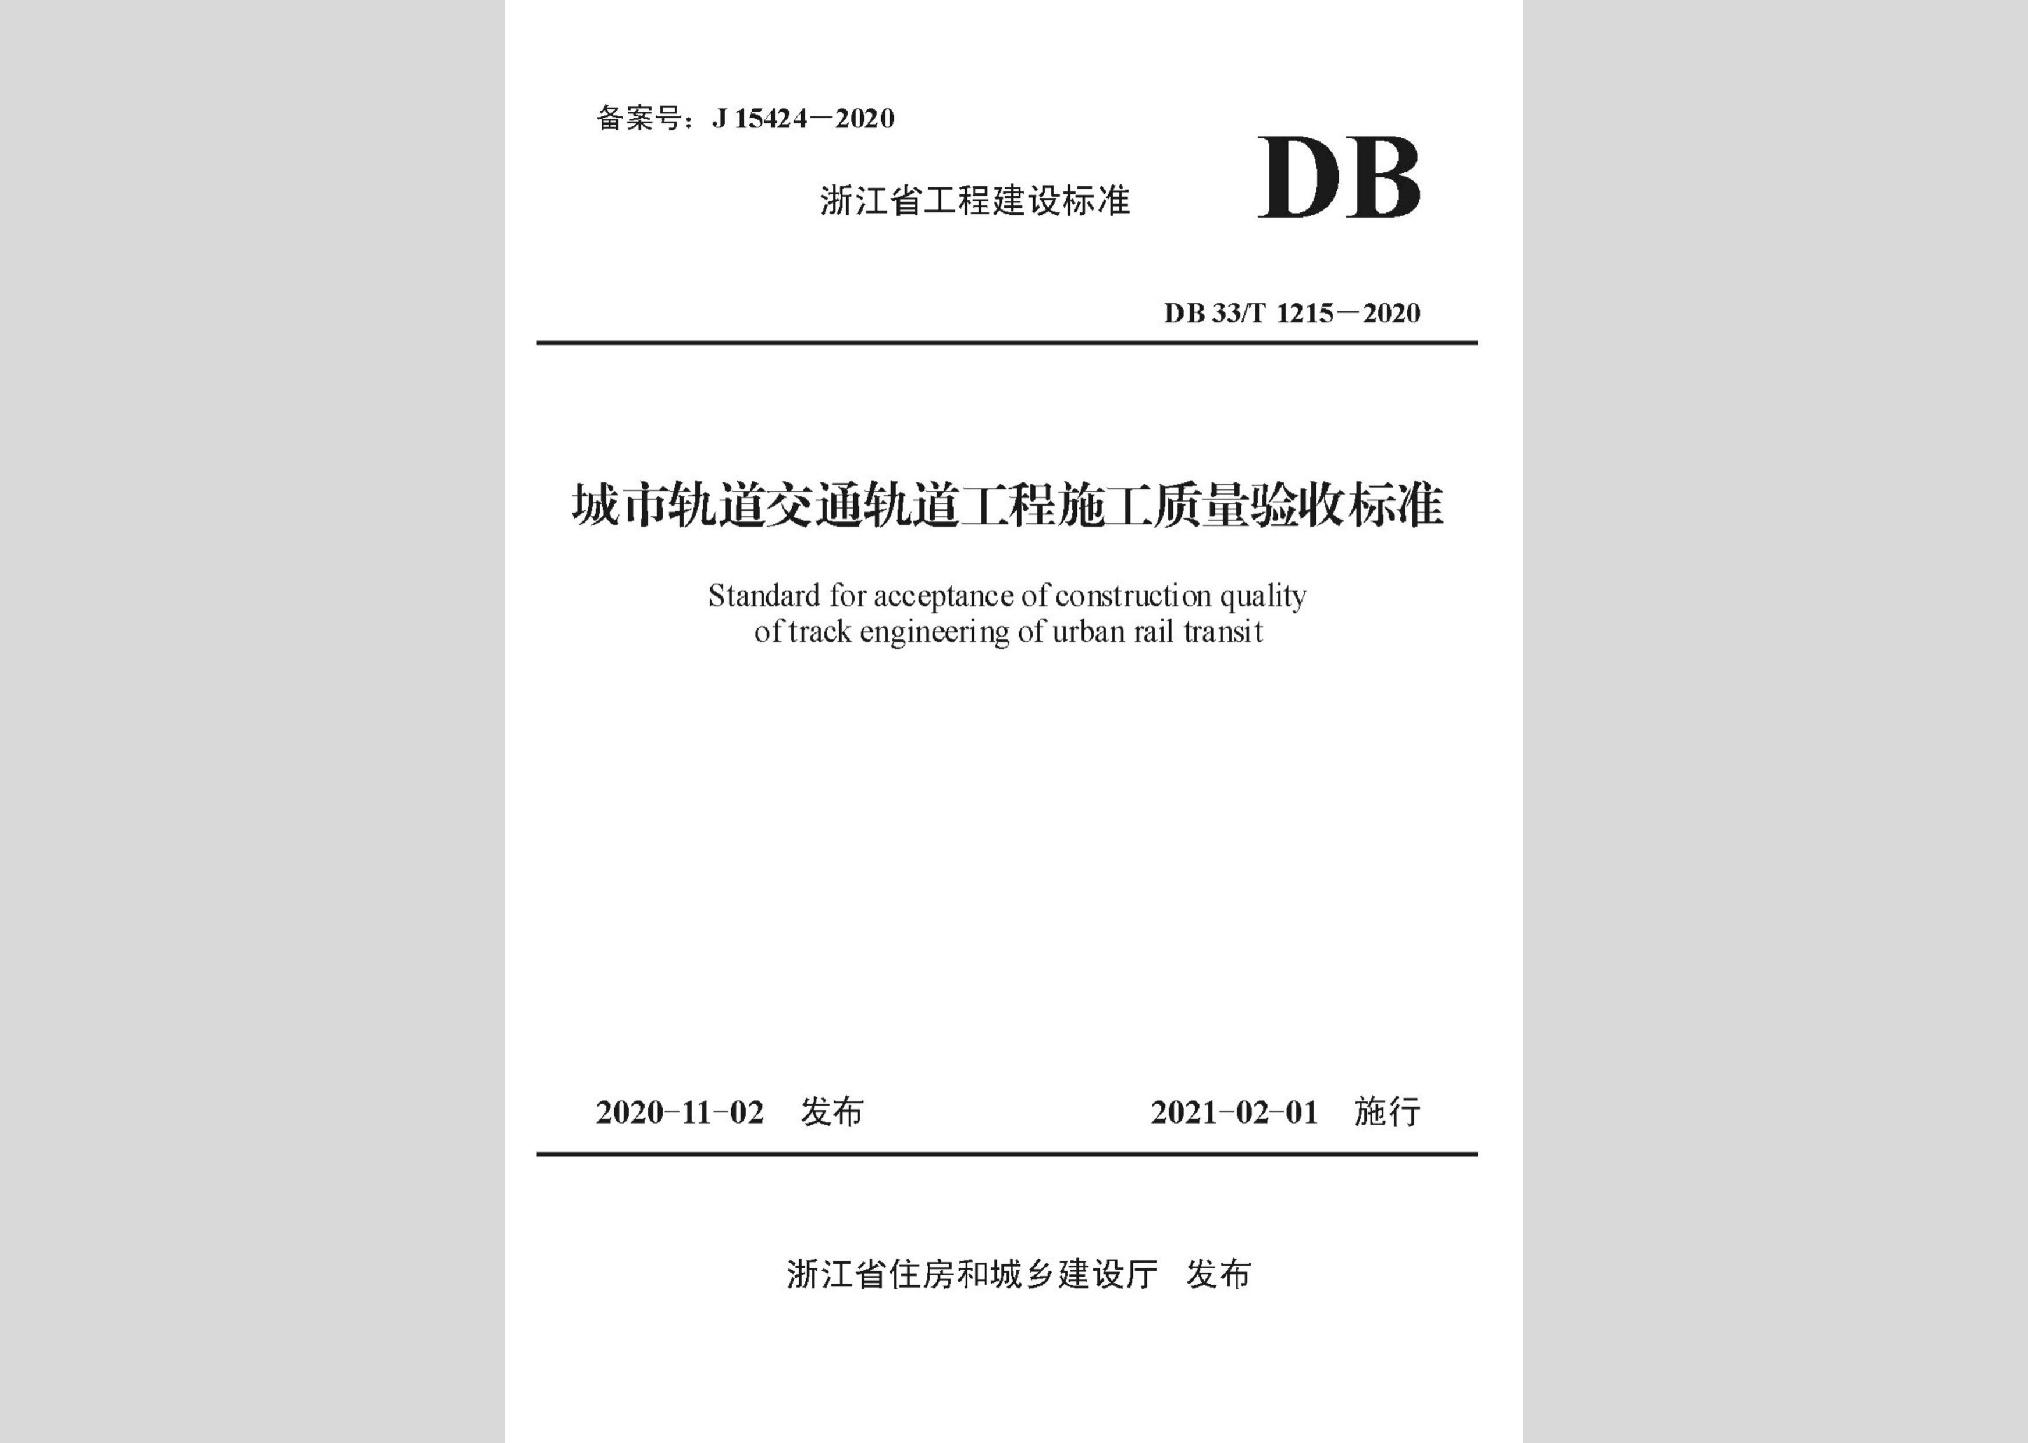 DB33/T1215-2020:城市轨道交通轨道工程施工质量验收标准